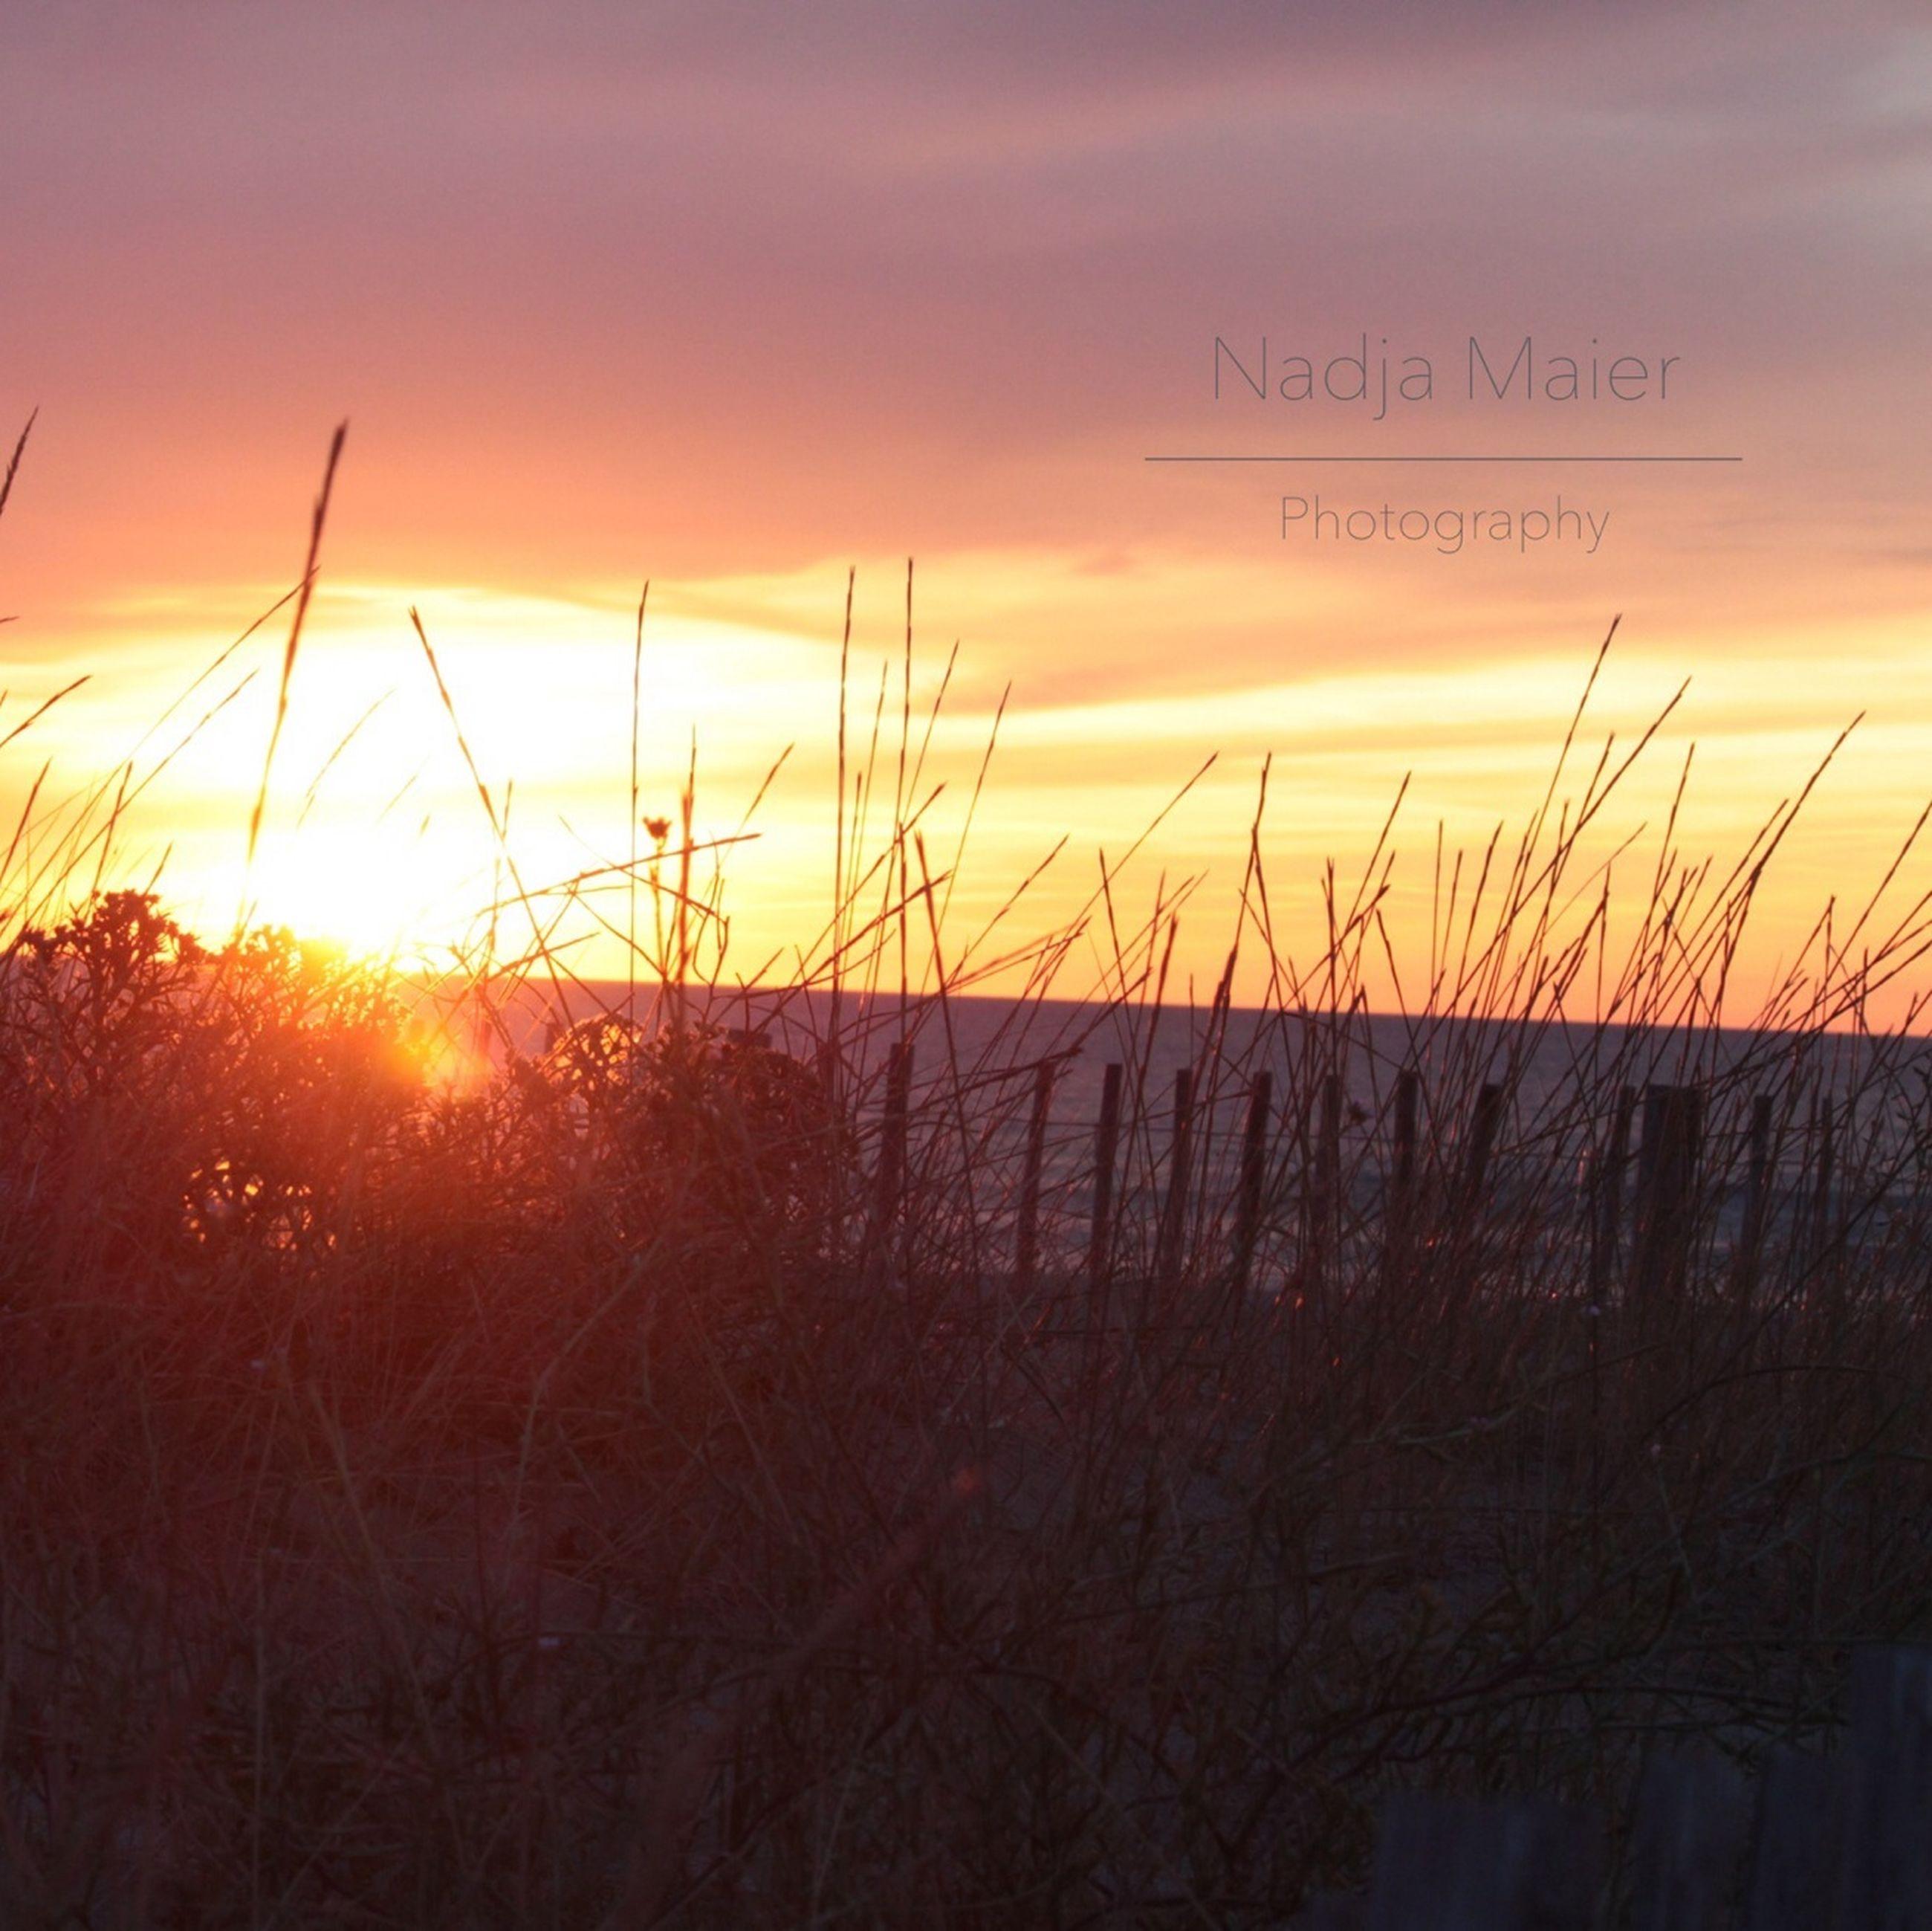 sunset, orange color, sun, scenics, tranquility, beauty in nature, tranquil scene, sky, nature, plant, idyllic, silhouette, sunlight, landscape, growth, field, outdoors, cloud - sky, no people, non-urban scene